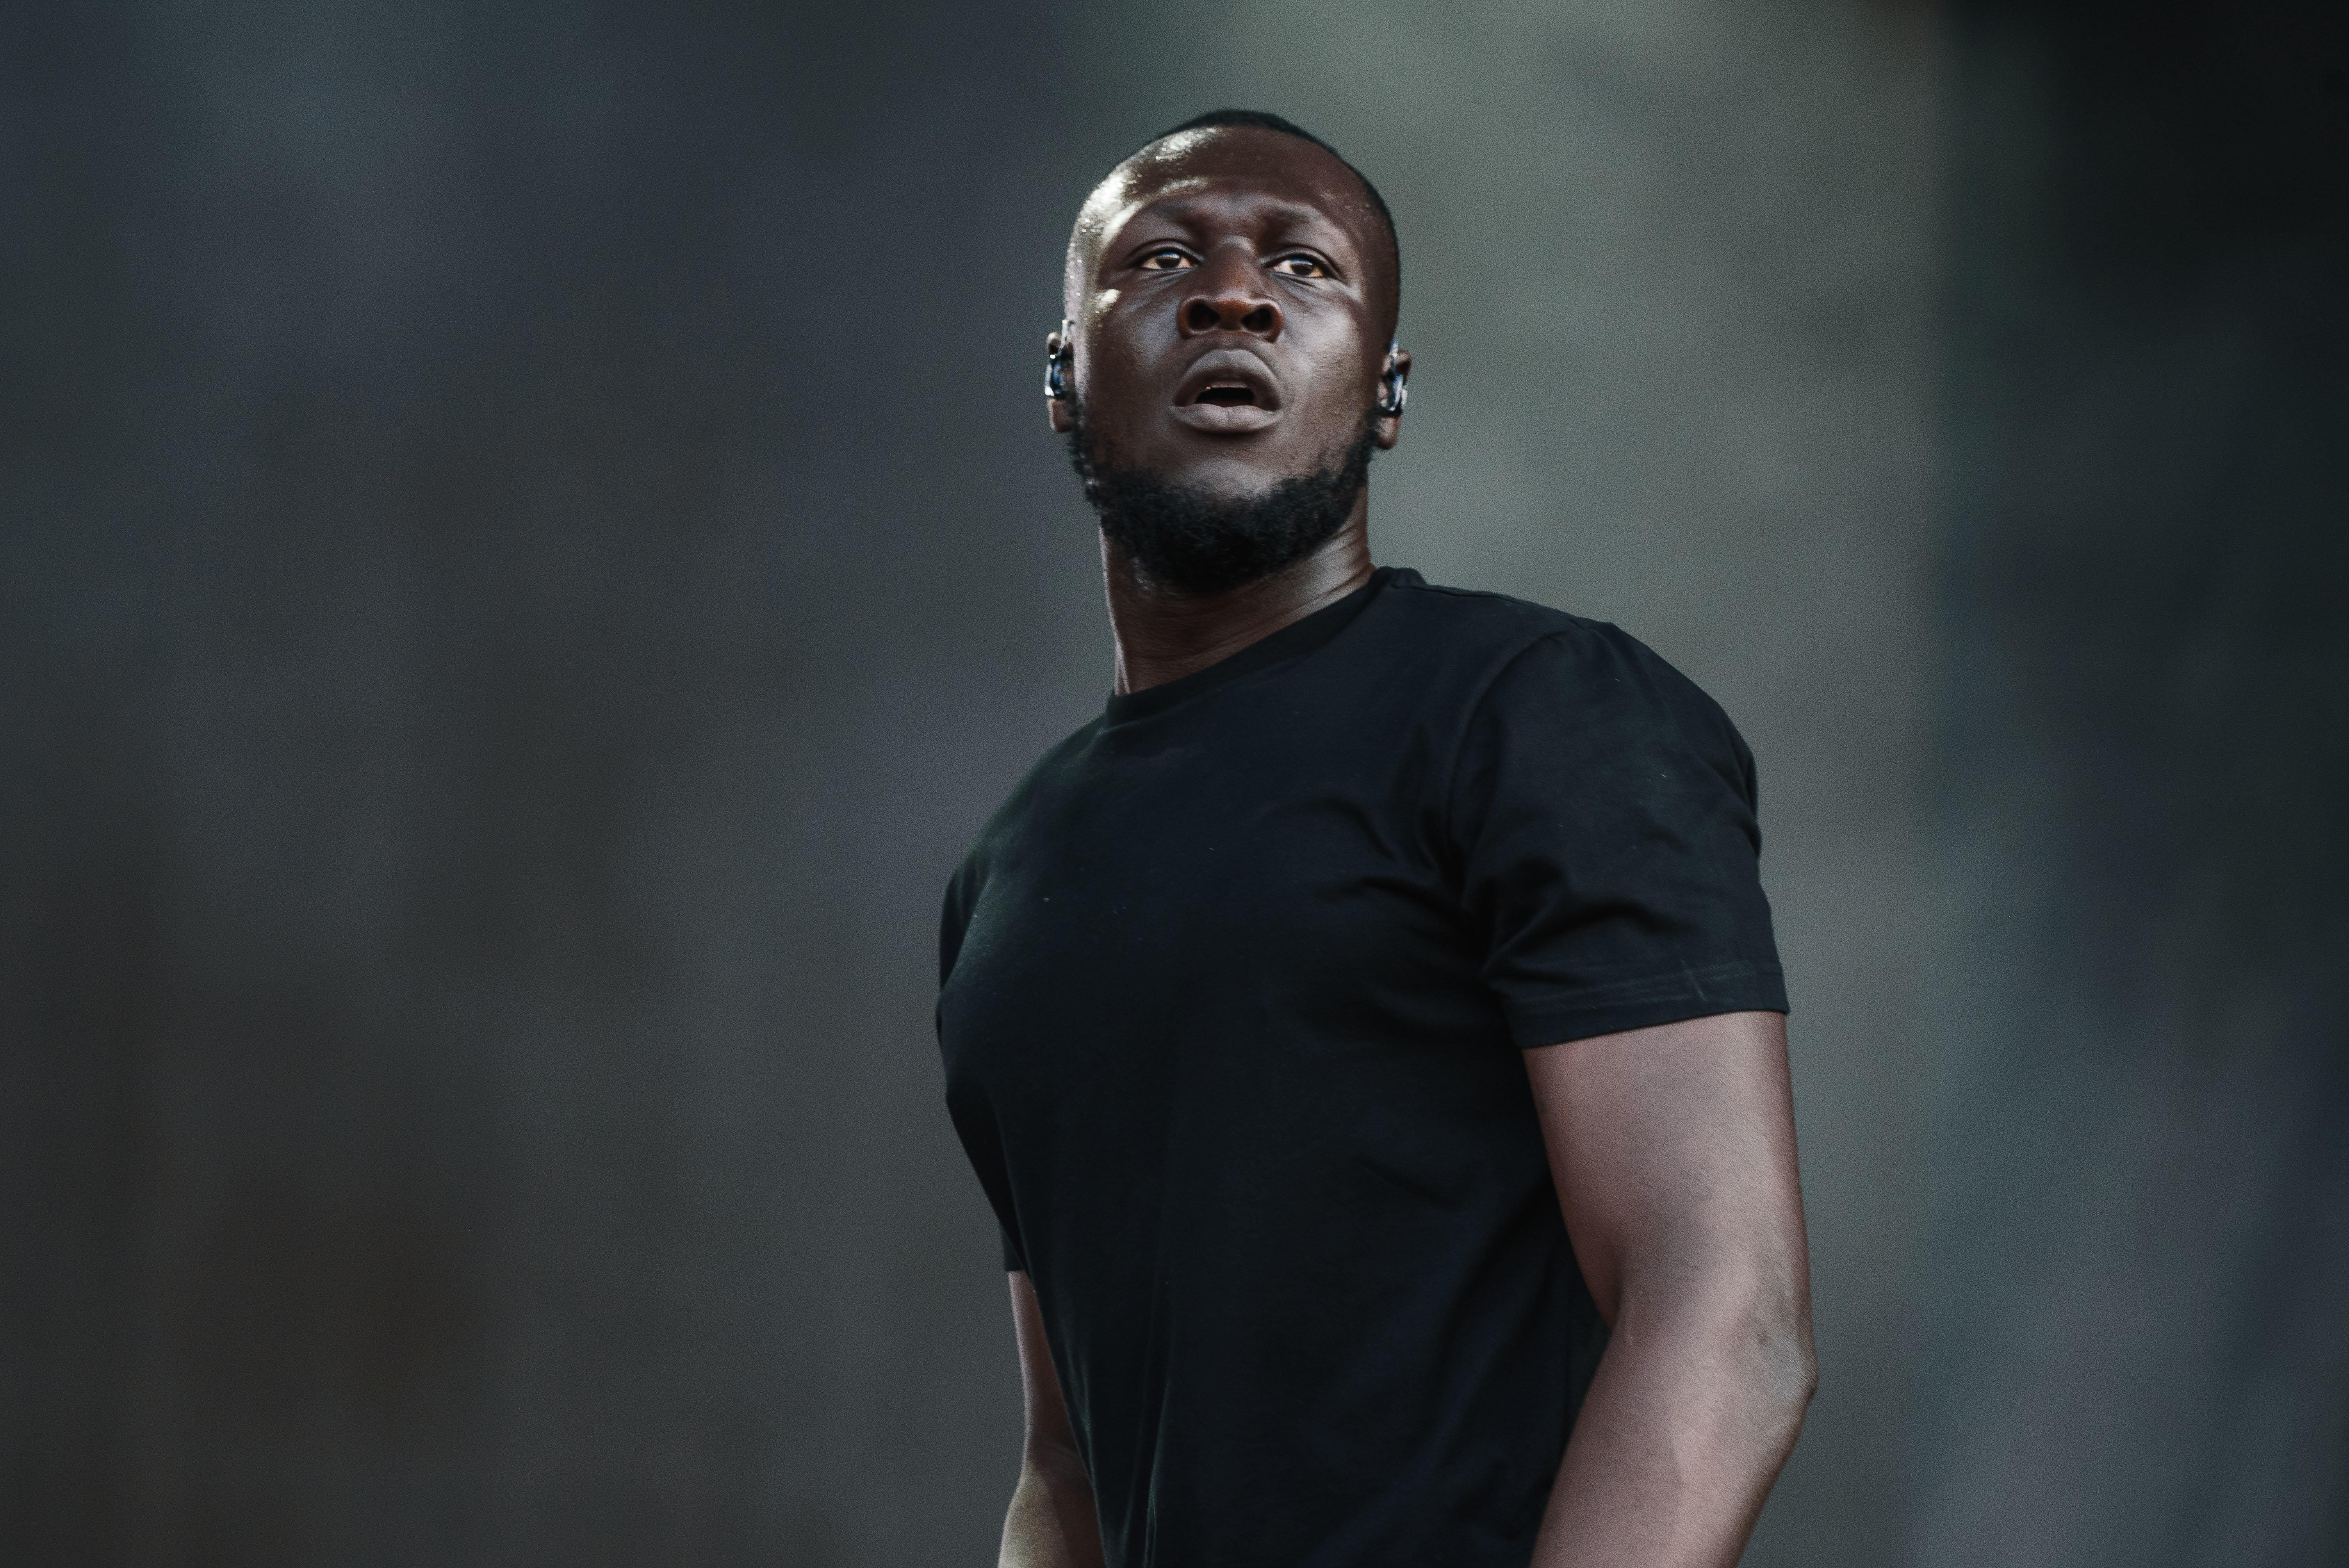 Stormzy Announces Scholarship To Fund Four Black British Students To Go To Cambridge